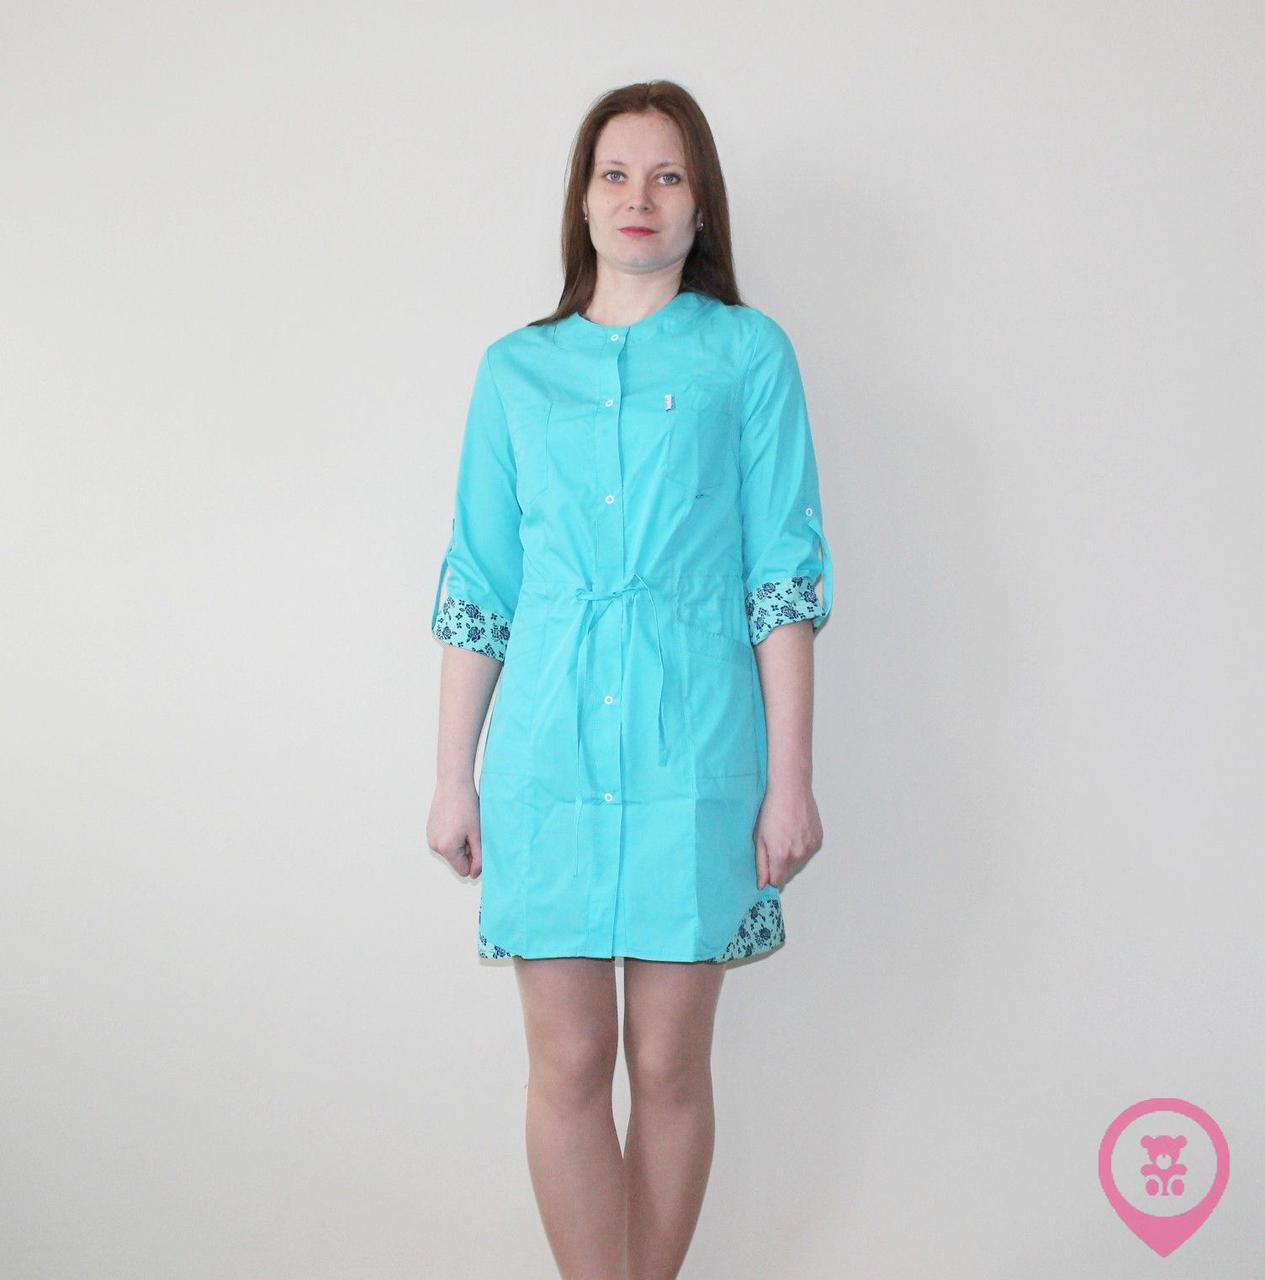 Медицинский женский халат SM 9140-7 Angela ХБ